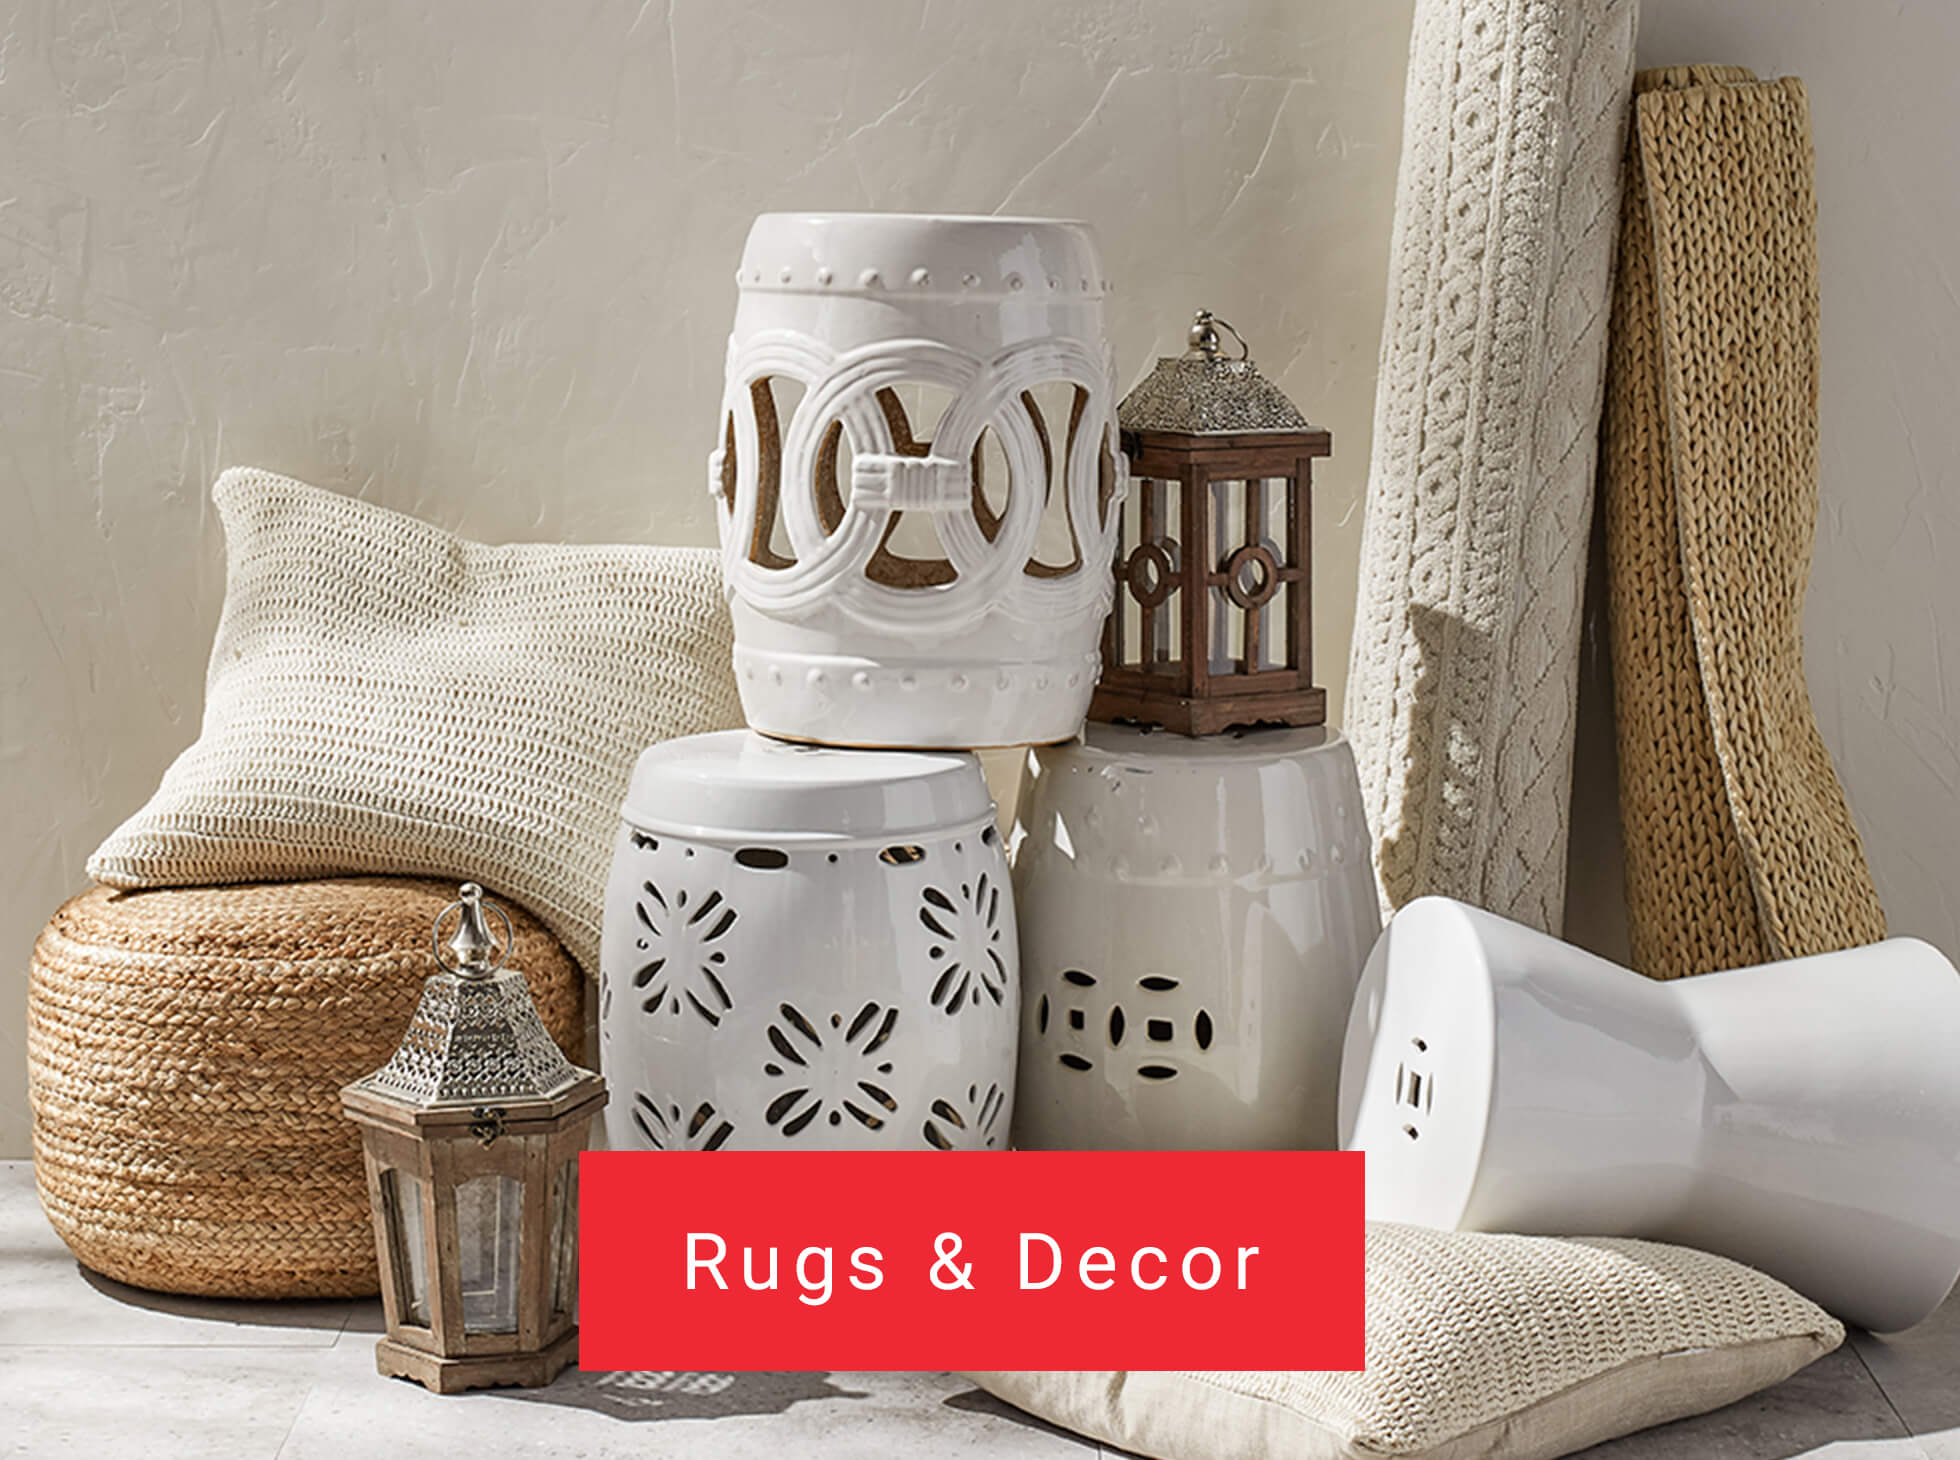 Rugs & Decor